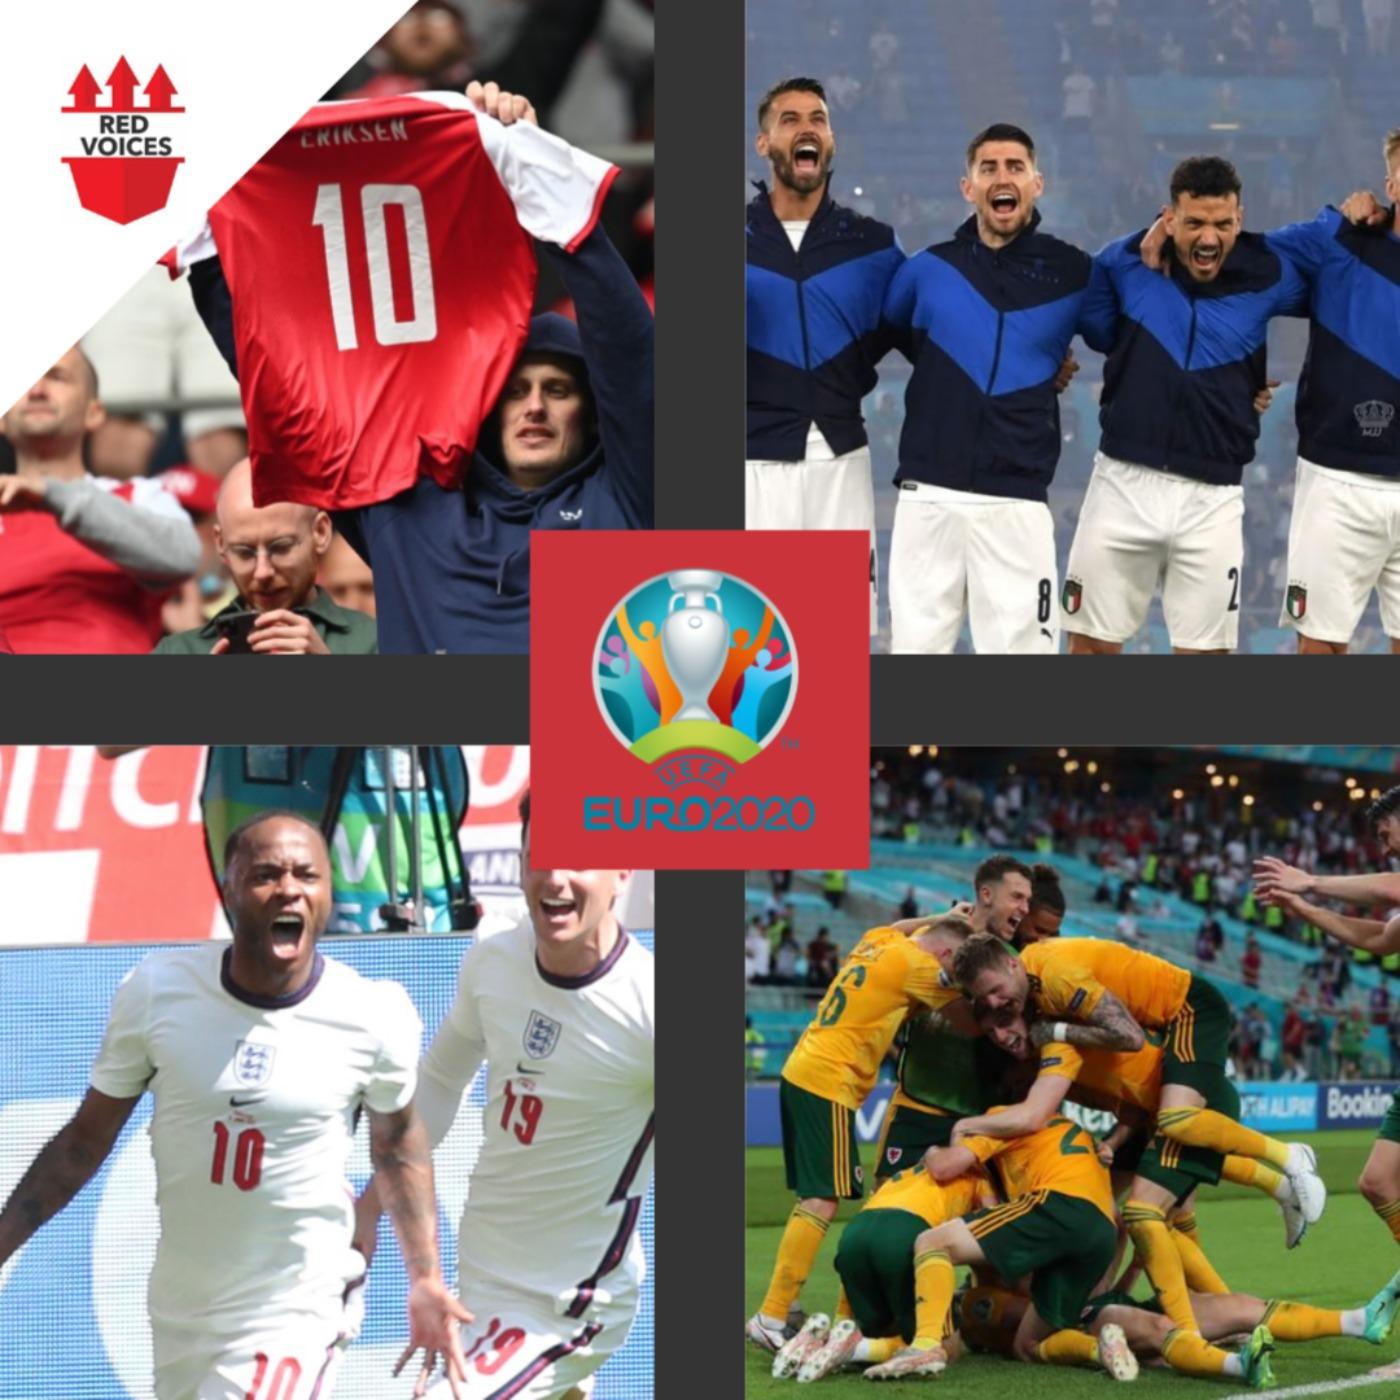 Episode 193 - Euro 2020 Special pt 1- No Rest